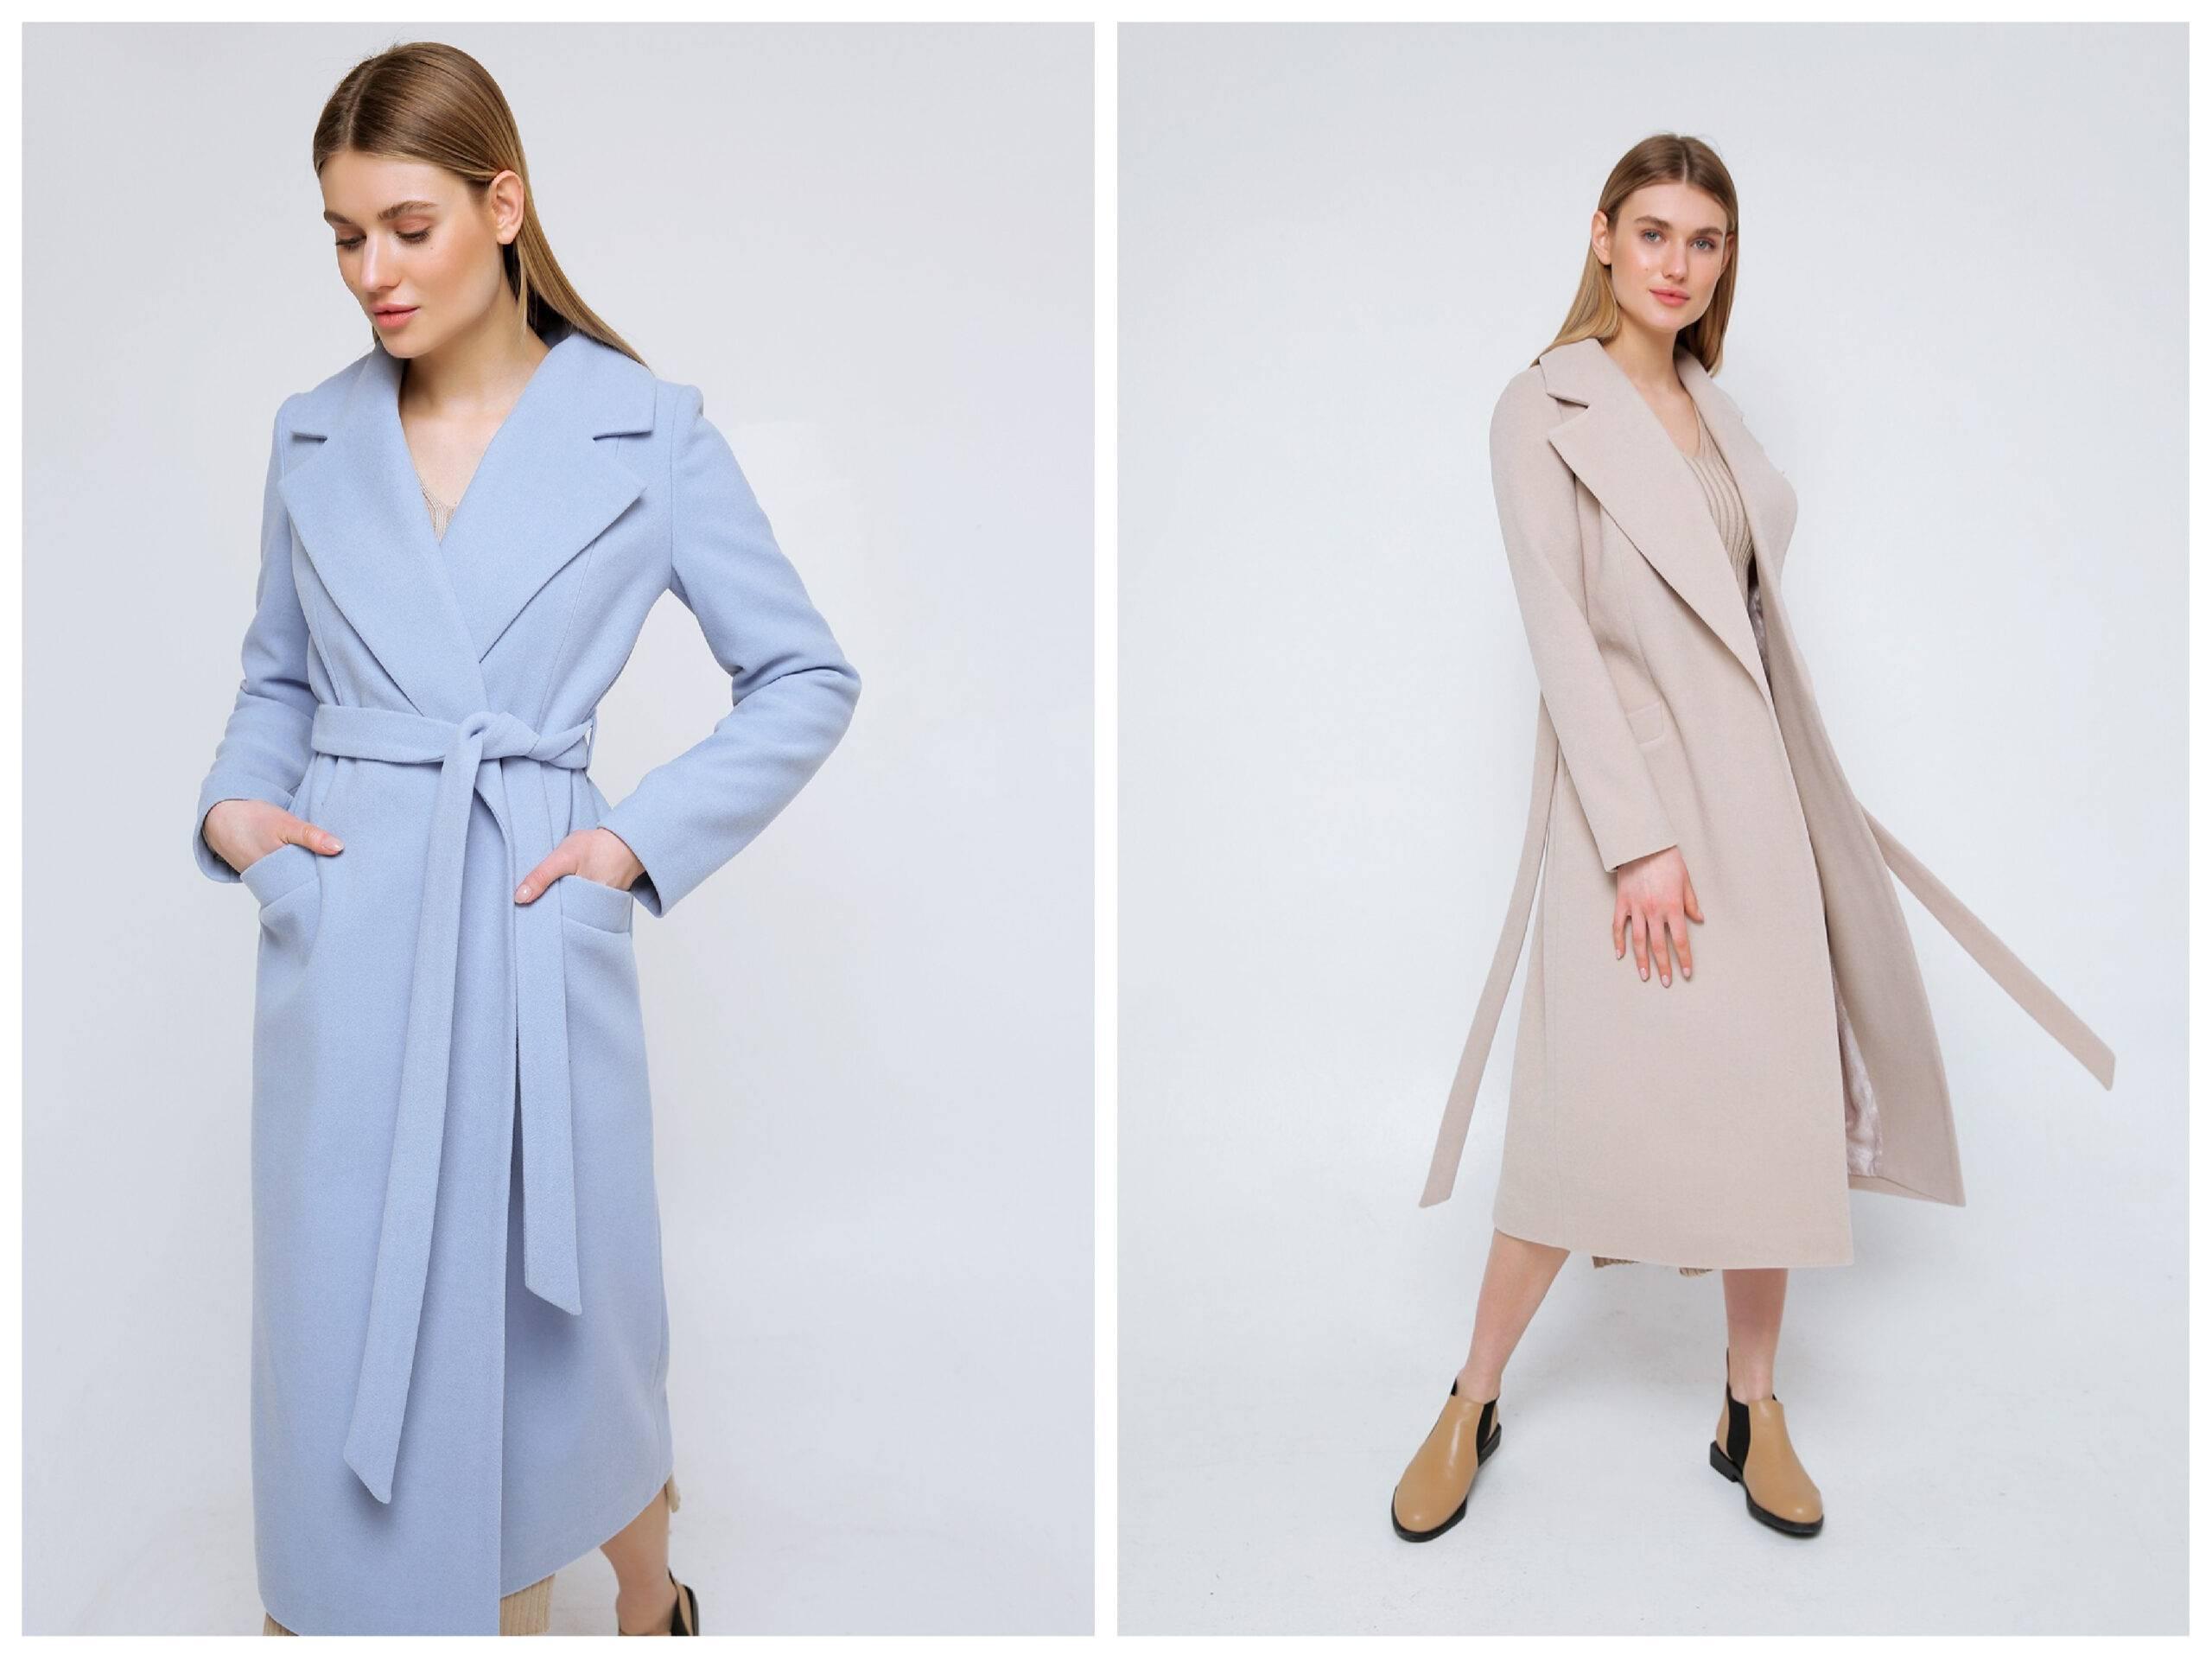 пальто на весну демісезонне купити україна